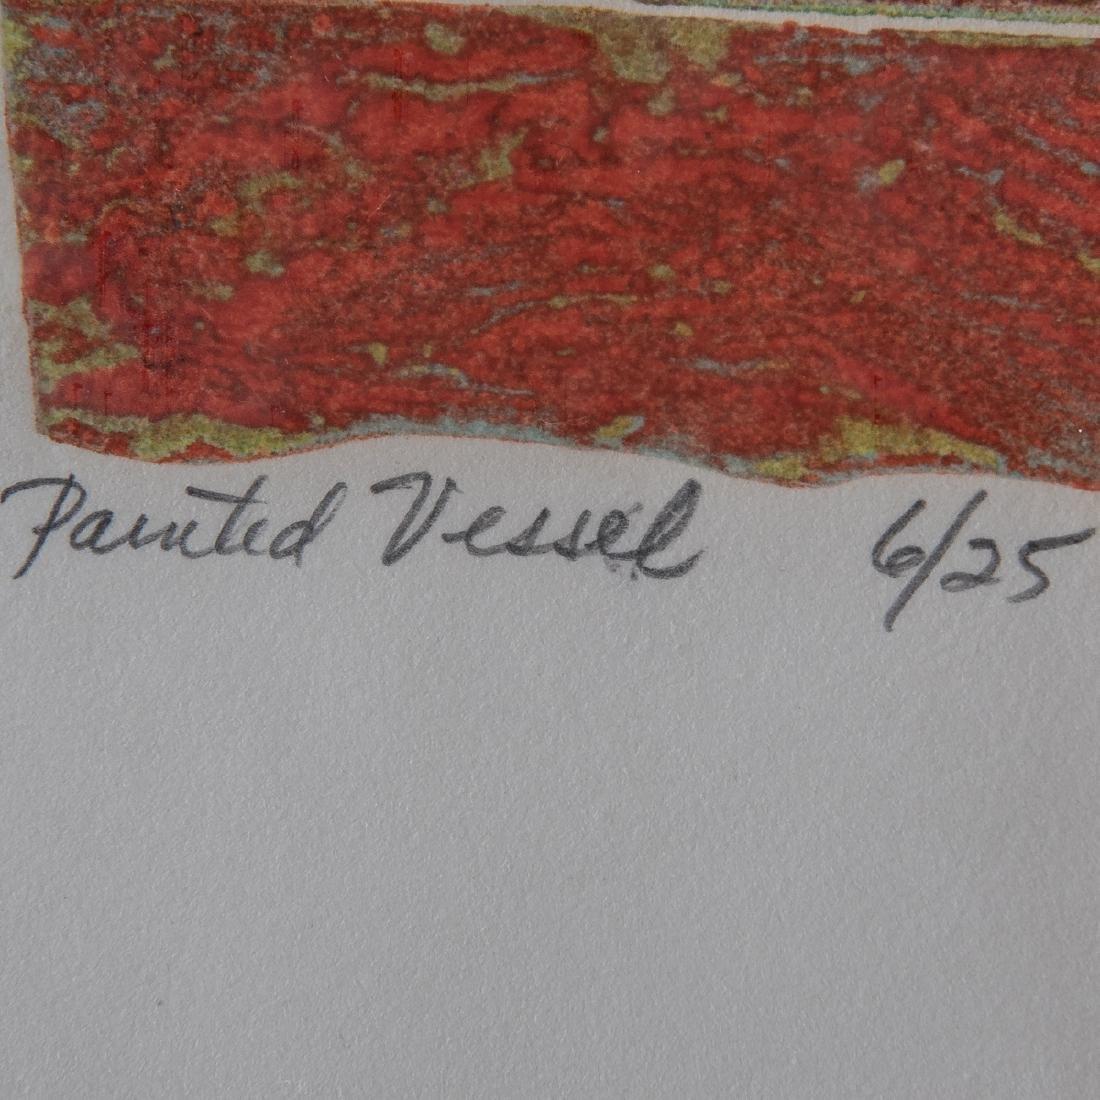 Frank Cassara (b. 1913) Painted Vessel, 1974, - 3